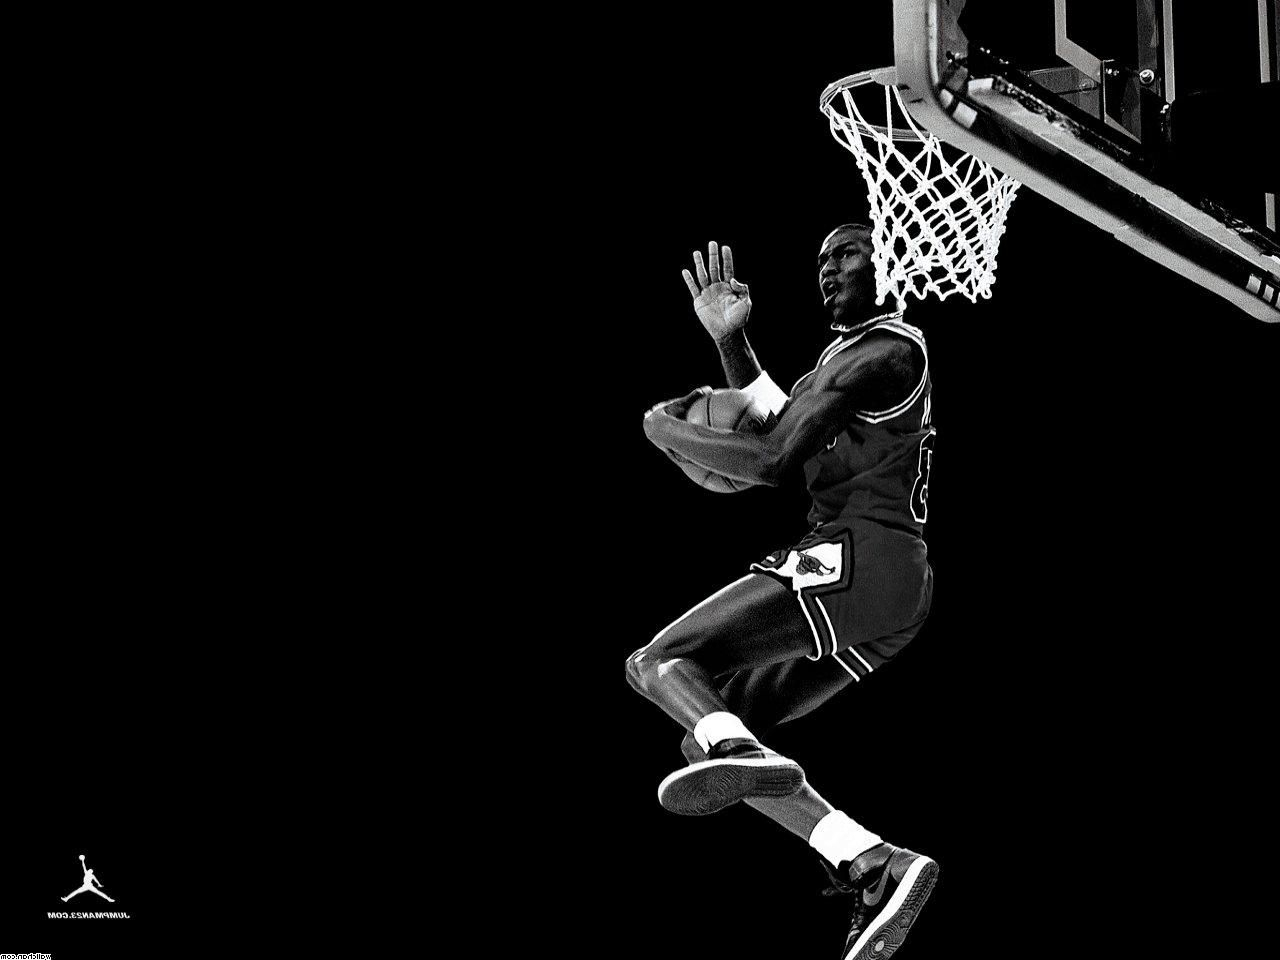 Michael Jordan White Background: 10 Most Popular Michael Jordan Wallpaper Black And White